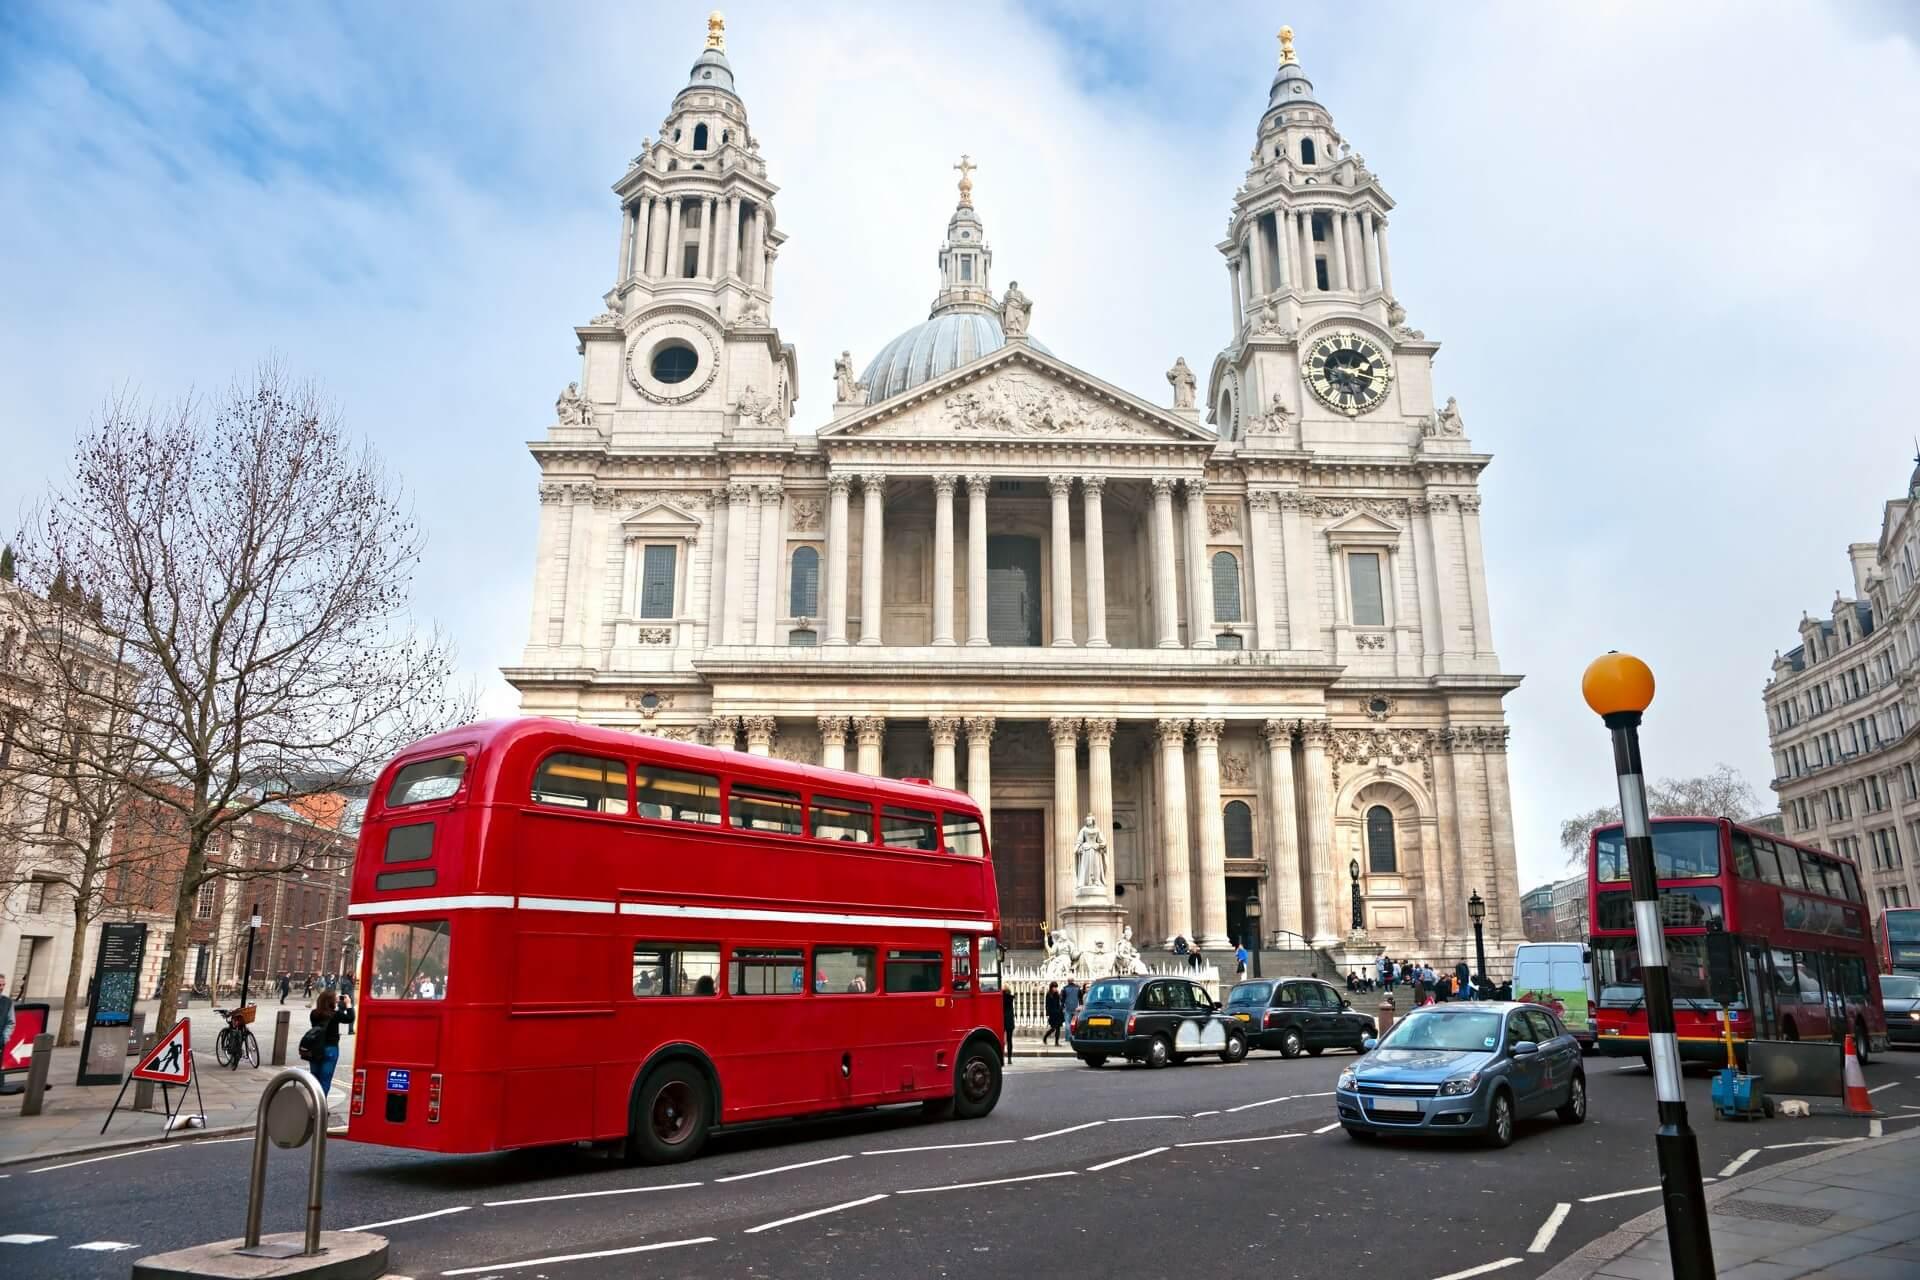 Tours Around London England